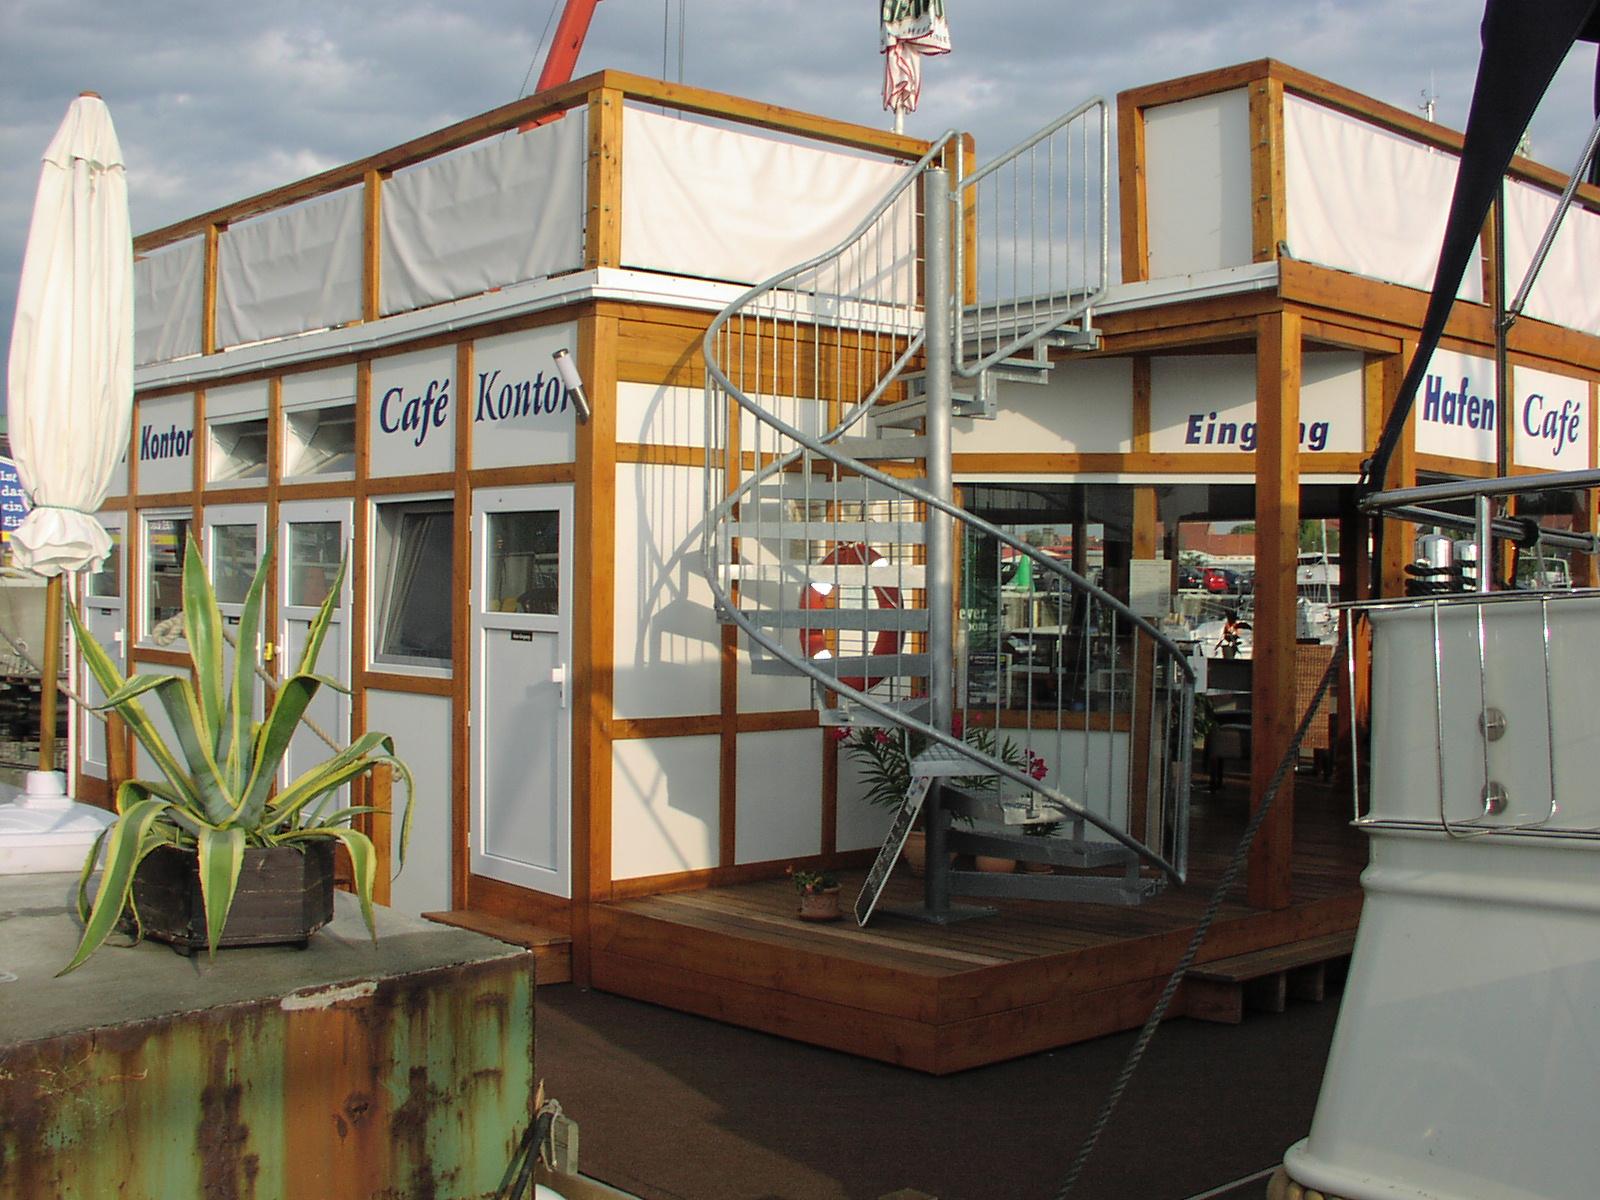 36 httpwww.westhafen.netgastronomie-beherbergungcafe.JPG